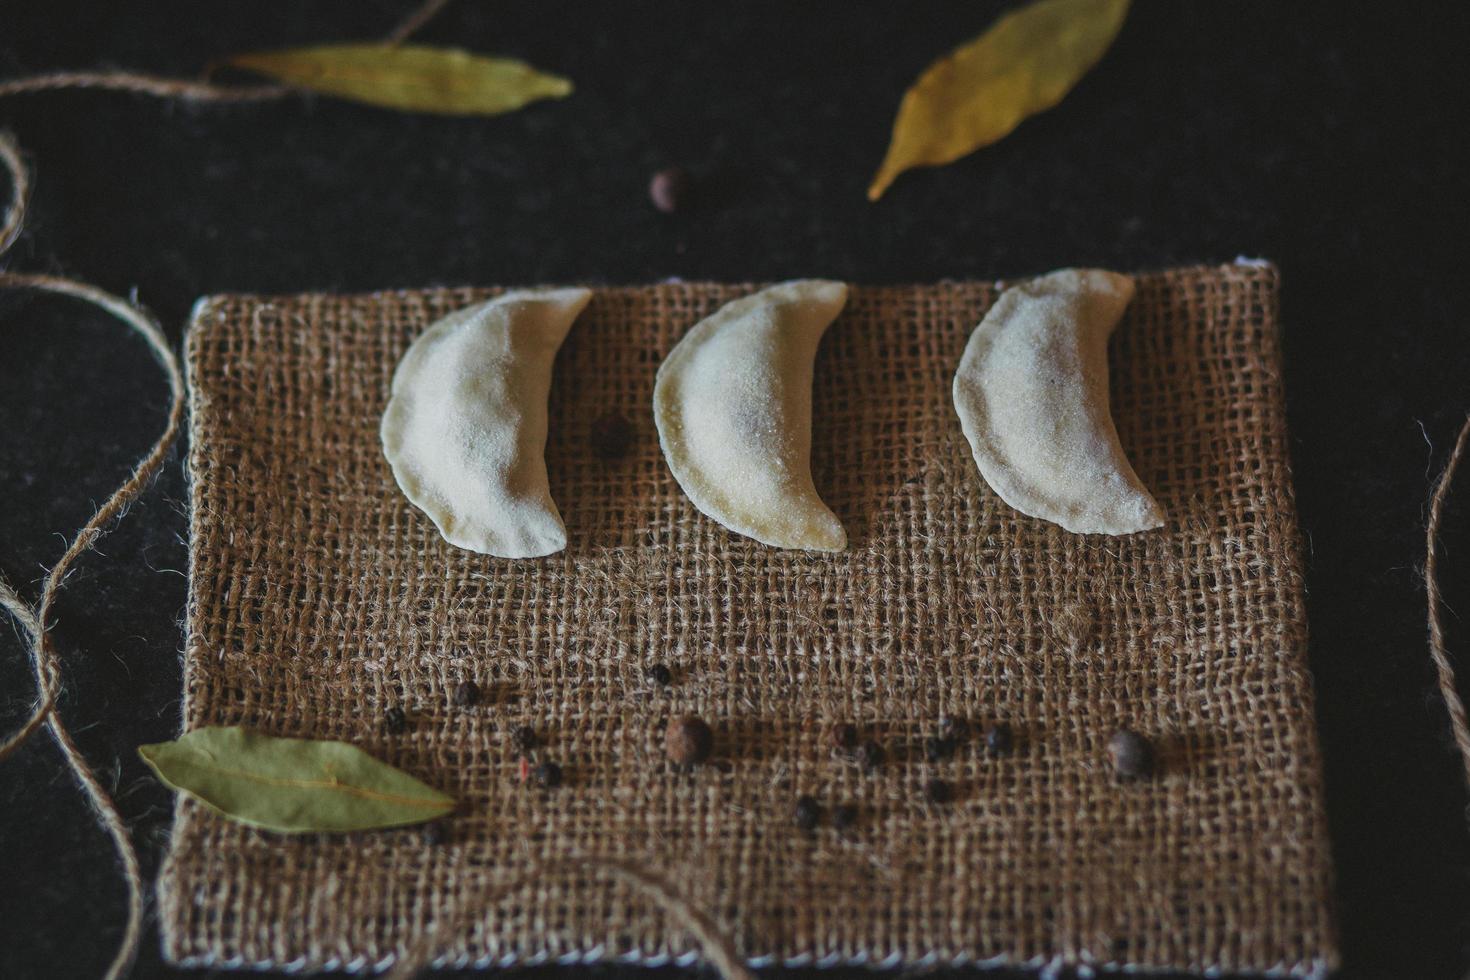 empanadas su stoffa foto